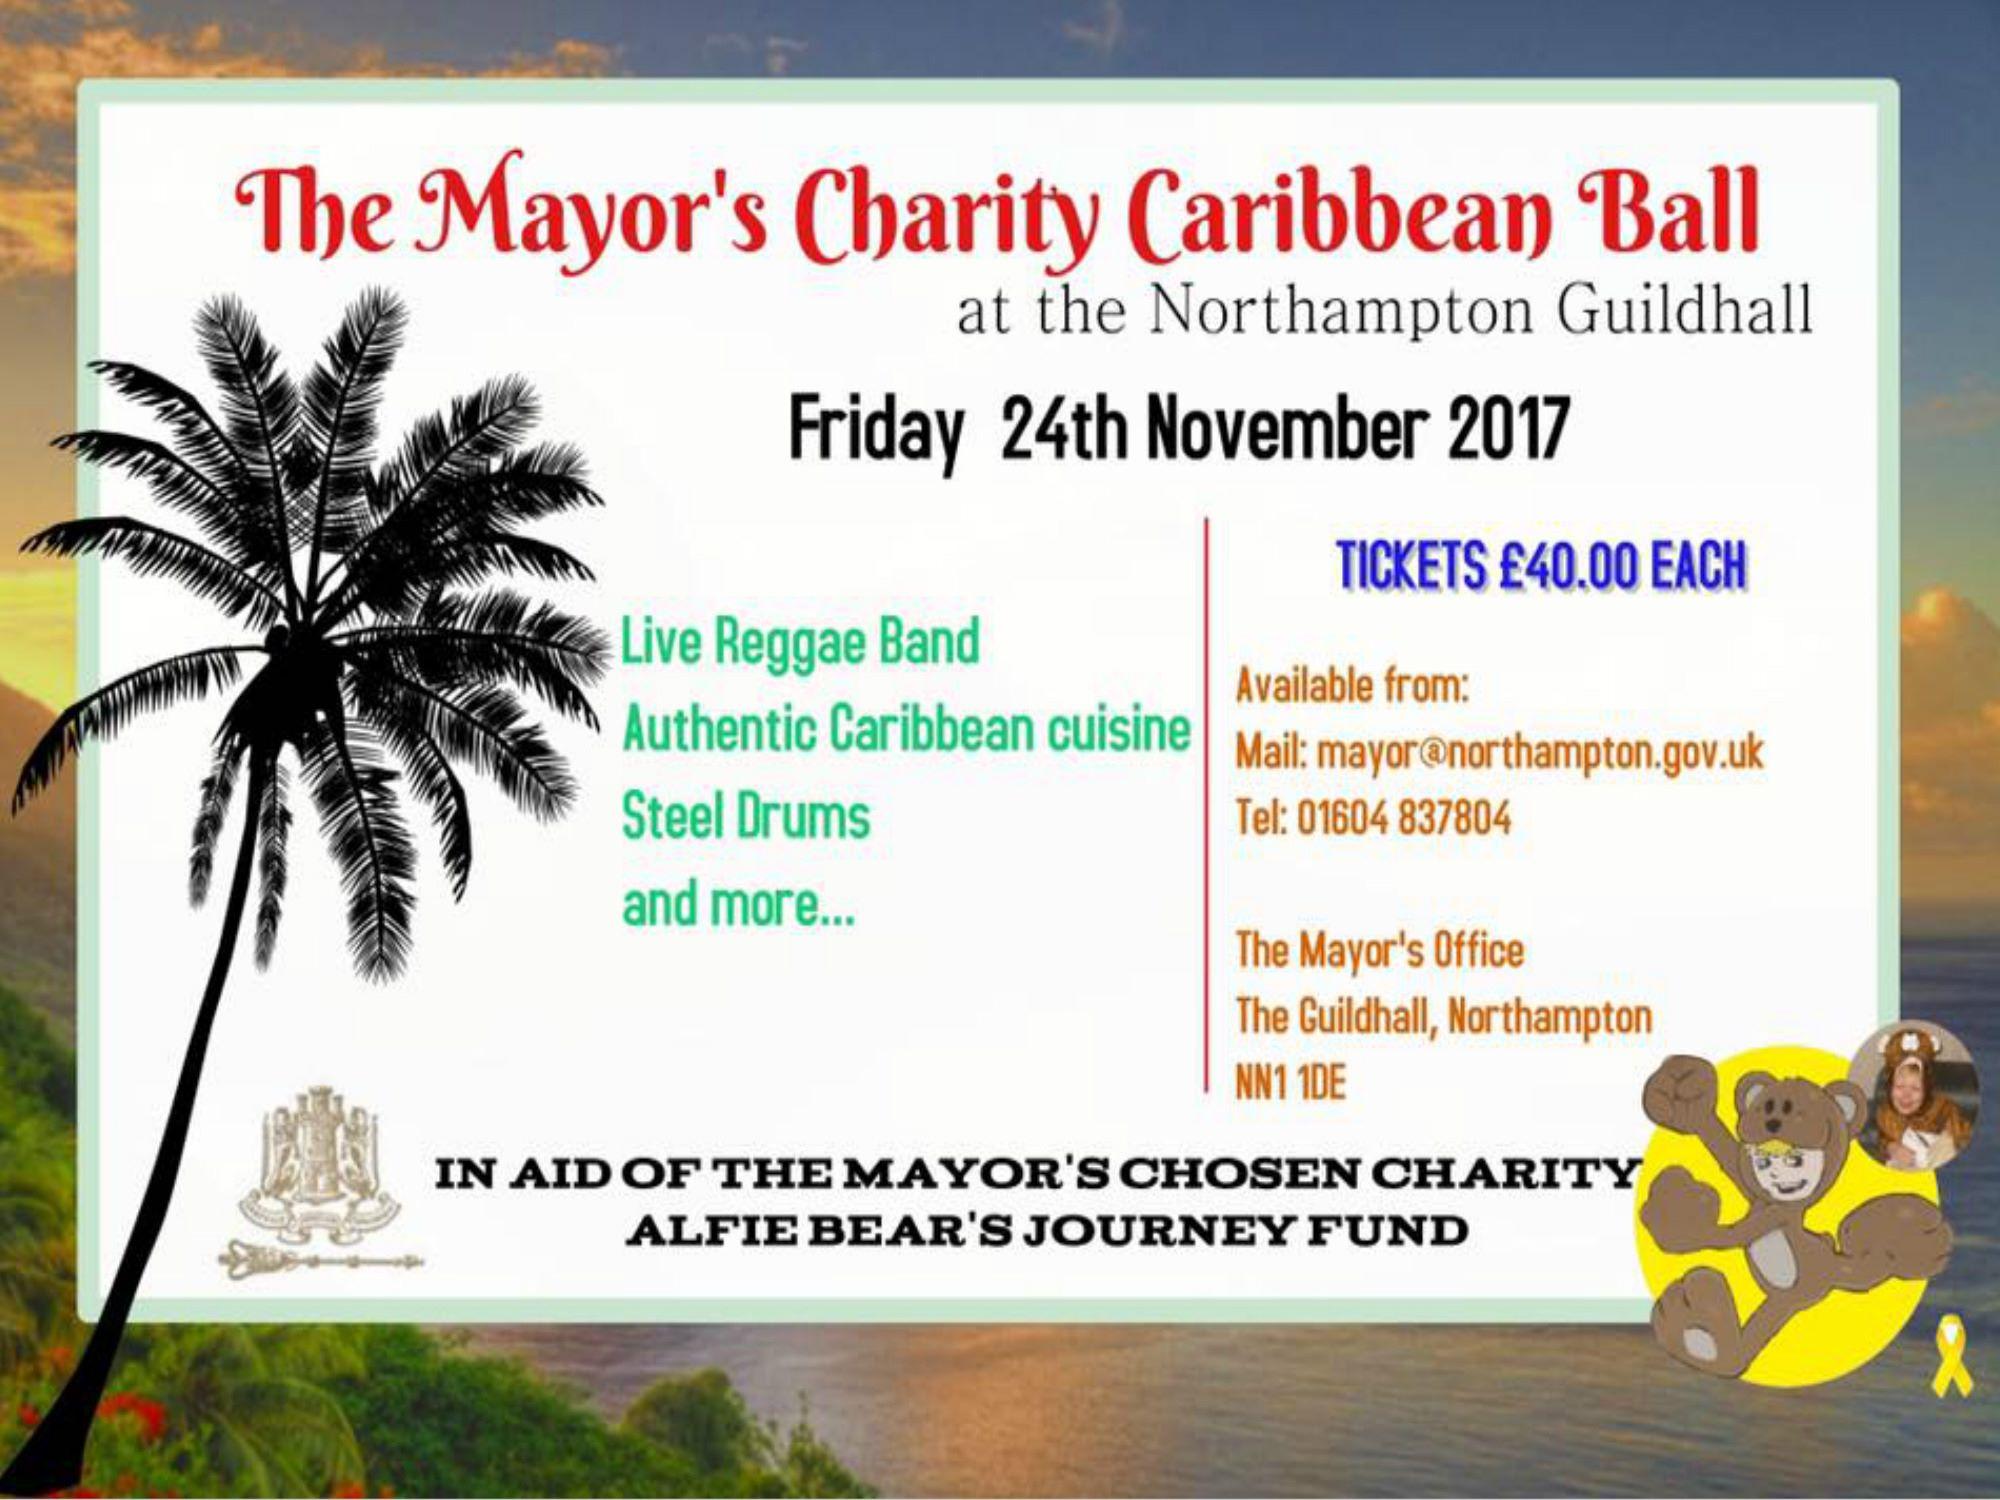 Mayor's Charity Caribbean Ball 2017